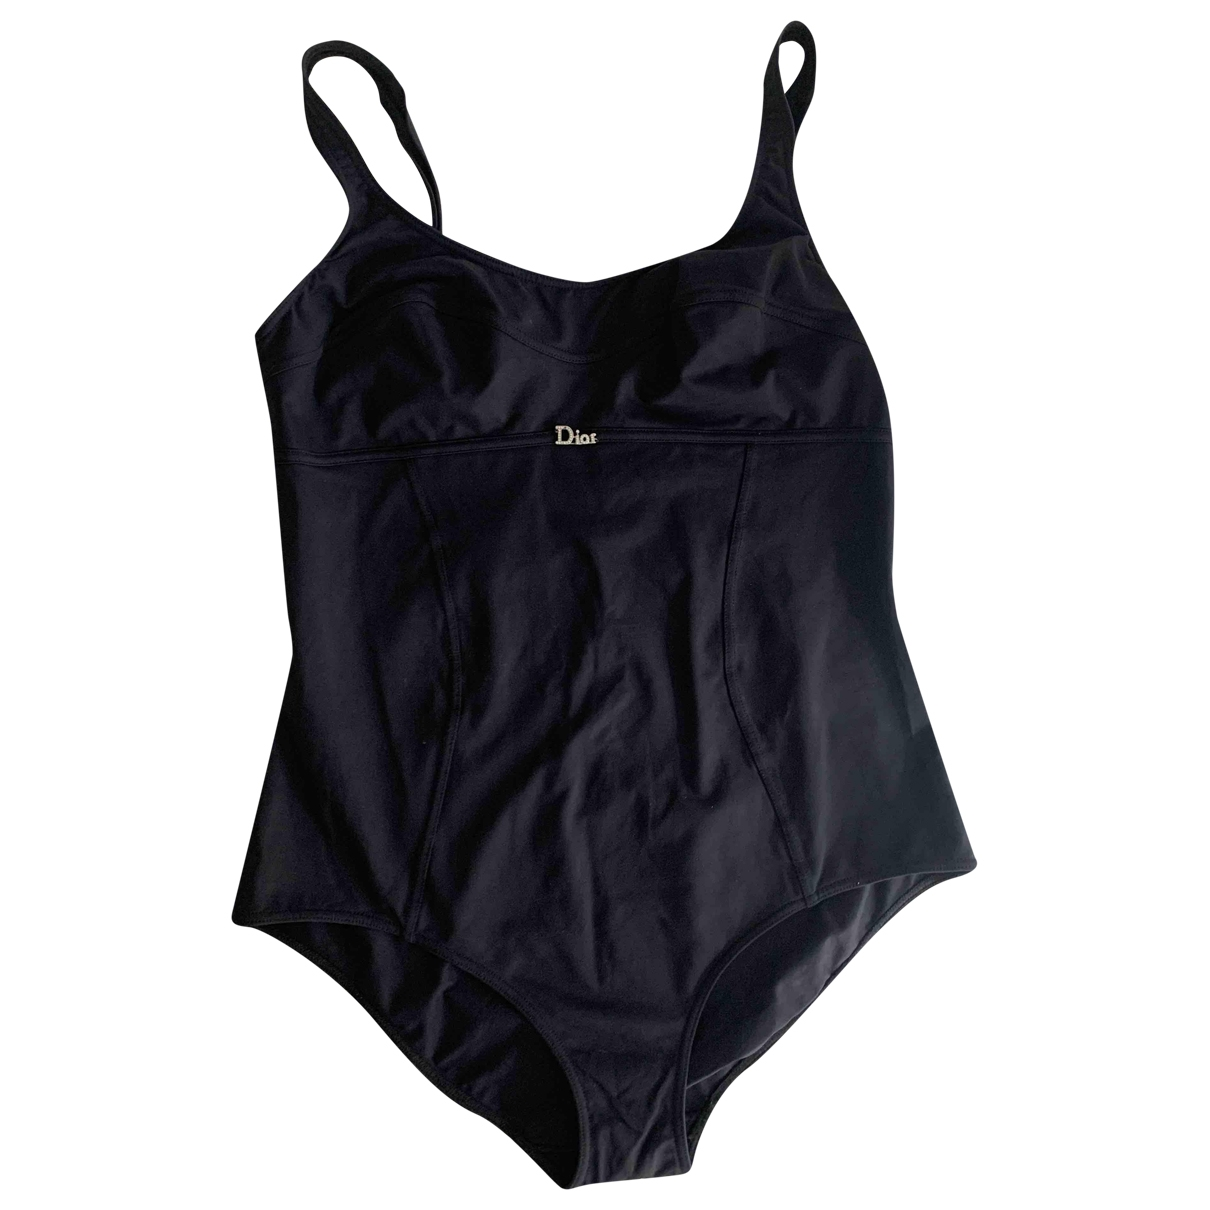 Dior \N Badeanzug in  Schwarz Polyester